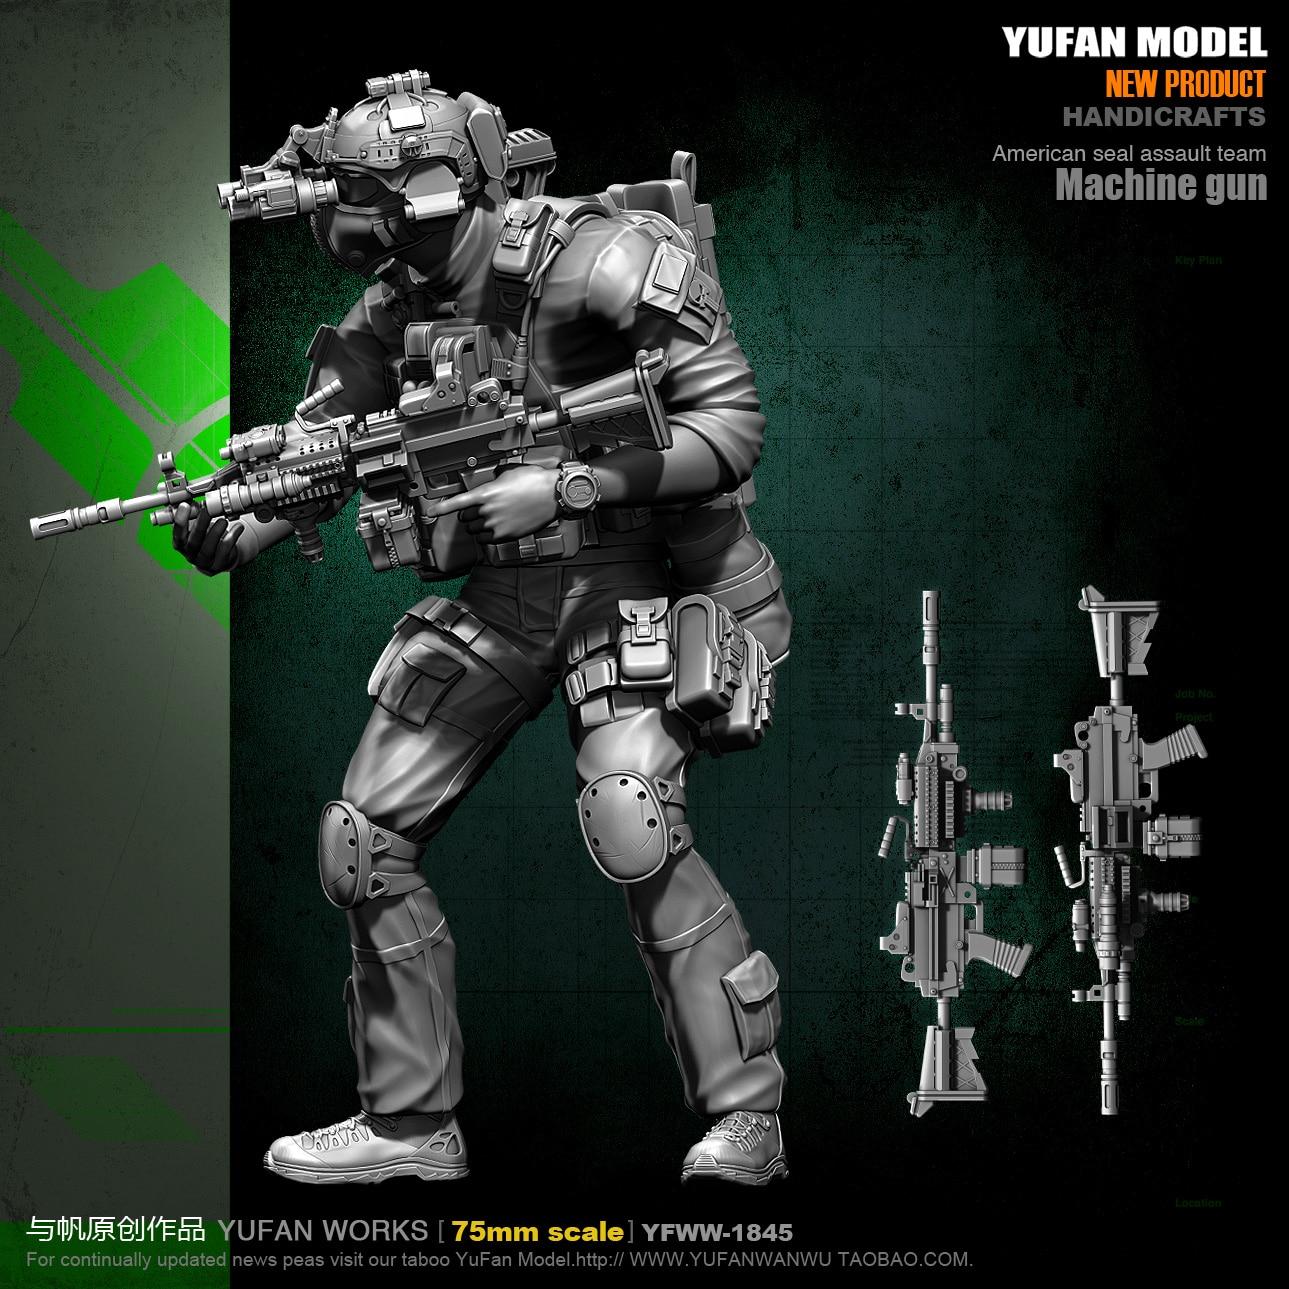 1/24 75mm Resin Figure Model Soldier (with Double Head) YFWW-1845